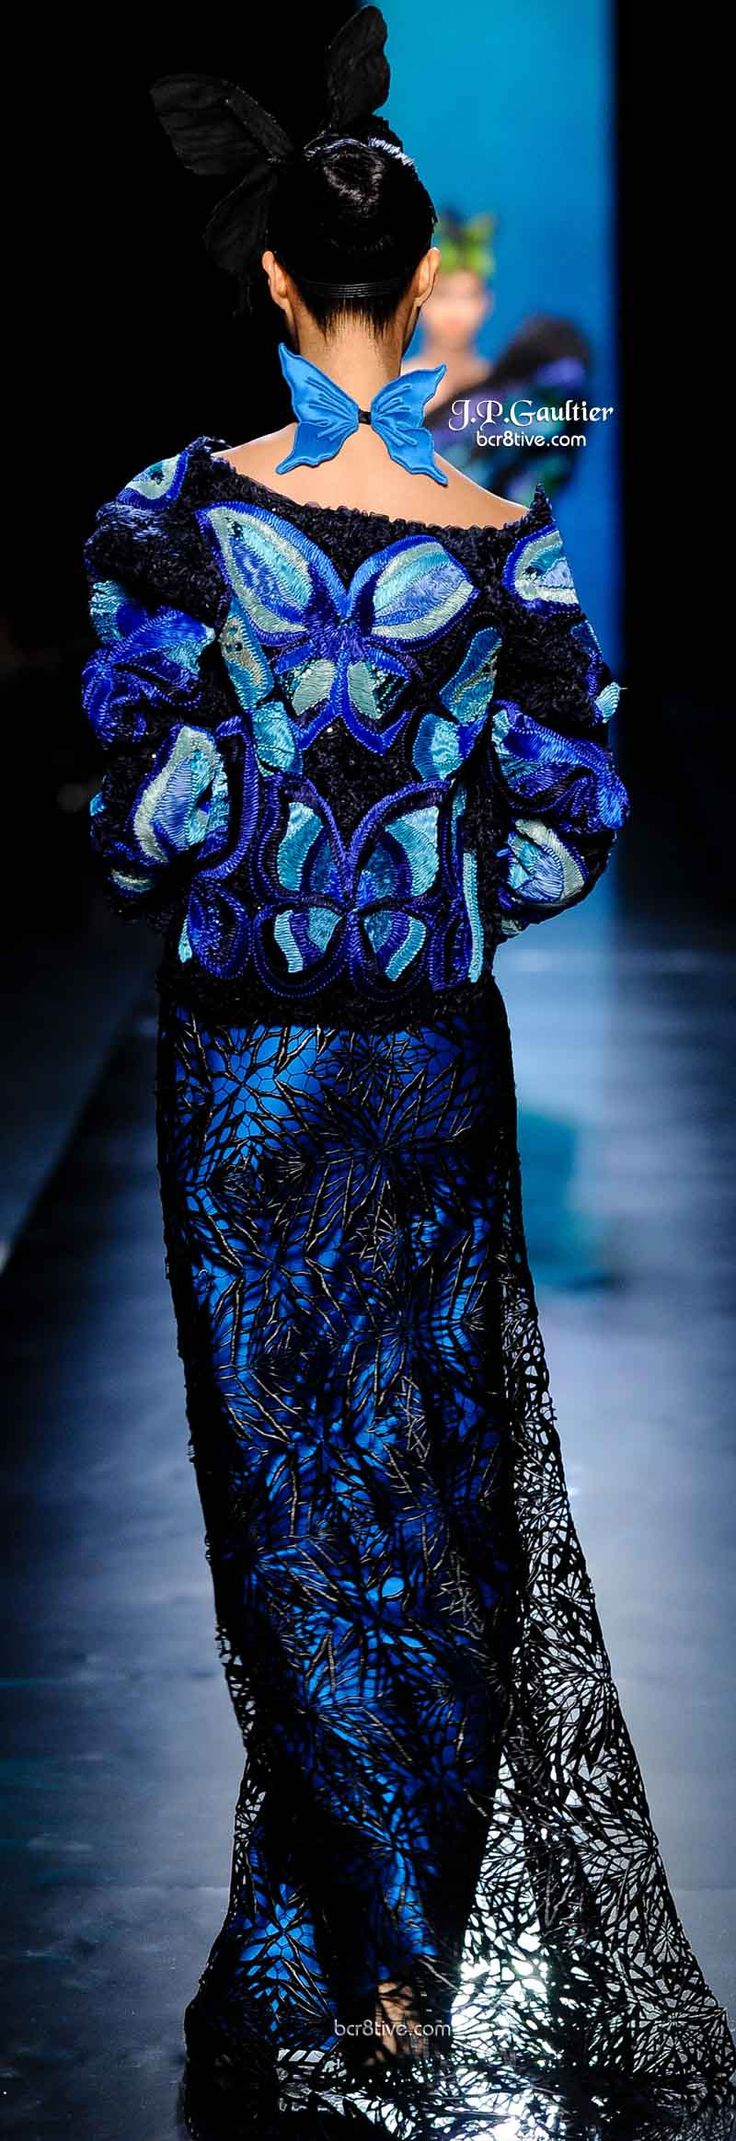 Jean Paul Gaultier Spring 2014 Couture| LBV ♥✤ | KeepSmiling | BeStayBeautiful